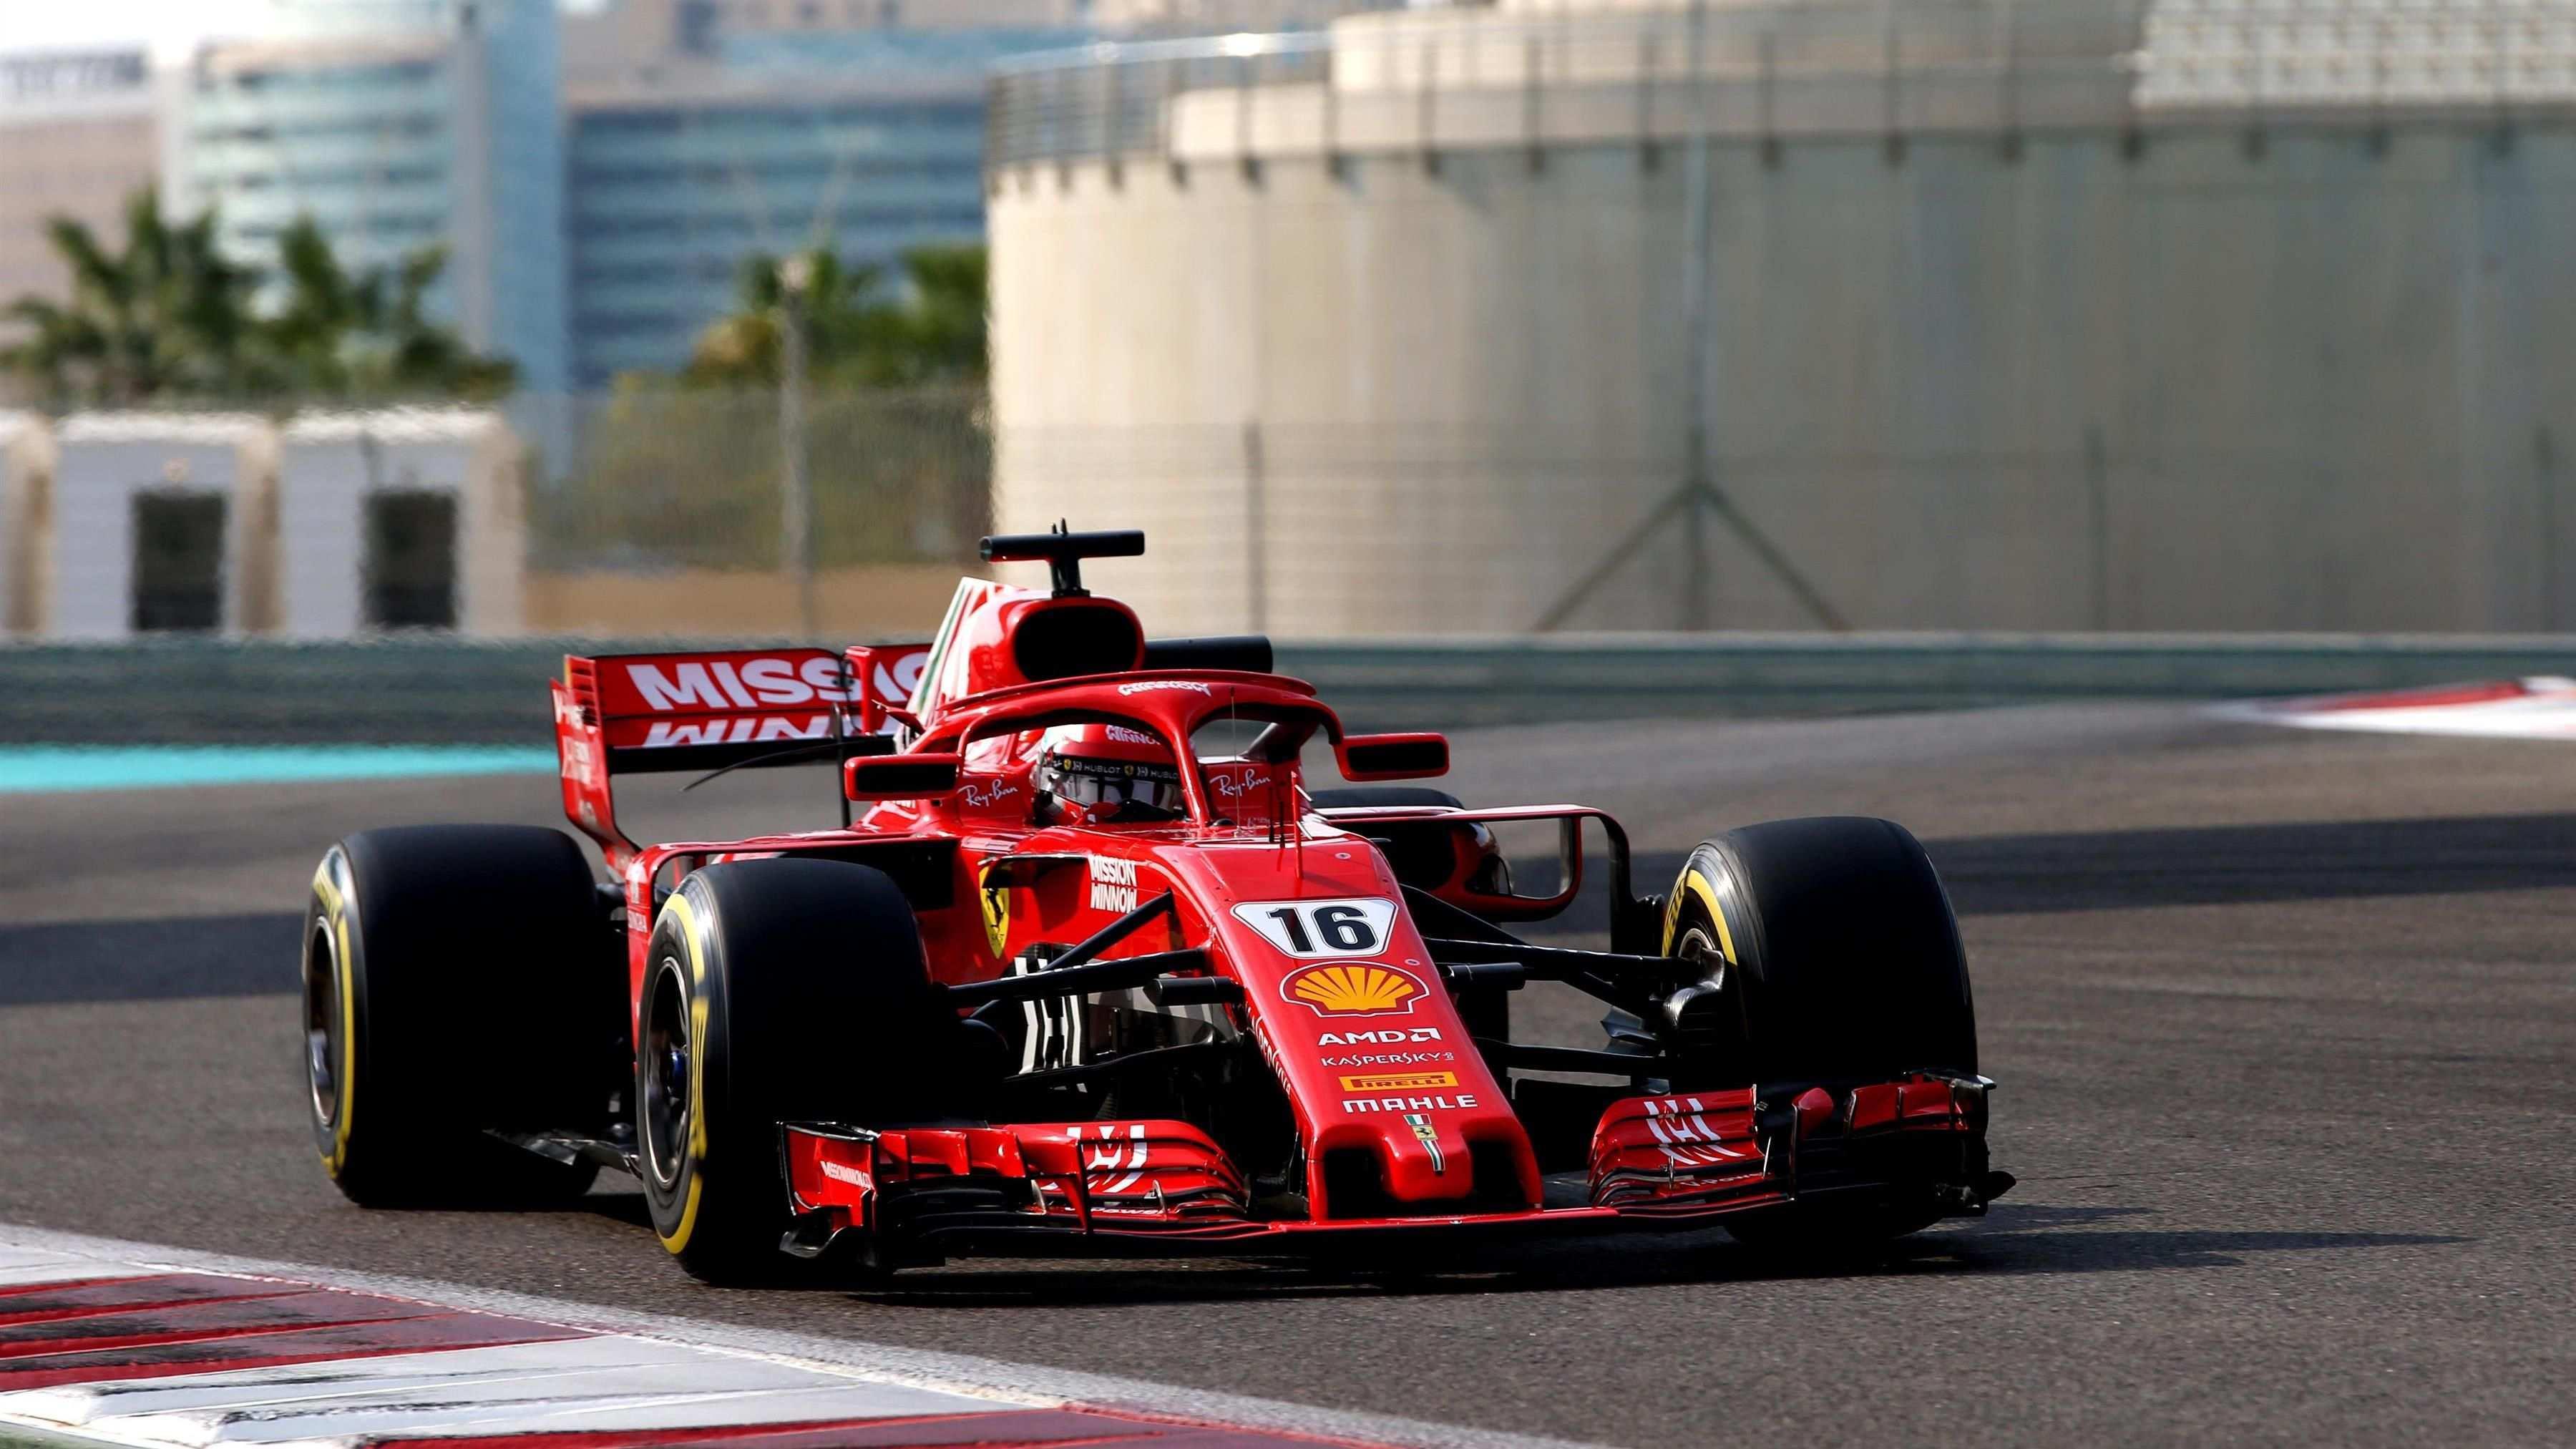 96 Great Best New Ferrari Driver F1 2019 Redesign Price And Review History for Best New Ferrari Driver F1 2019 Redesign Price And Review